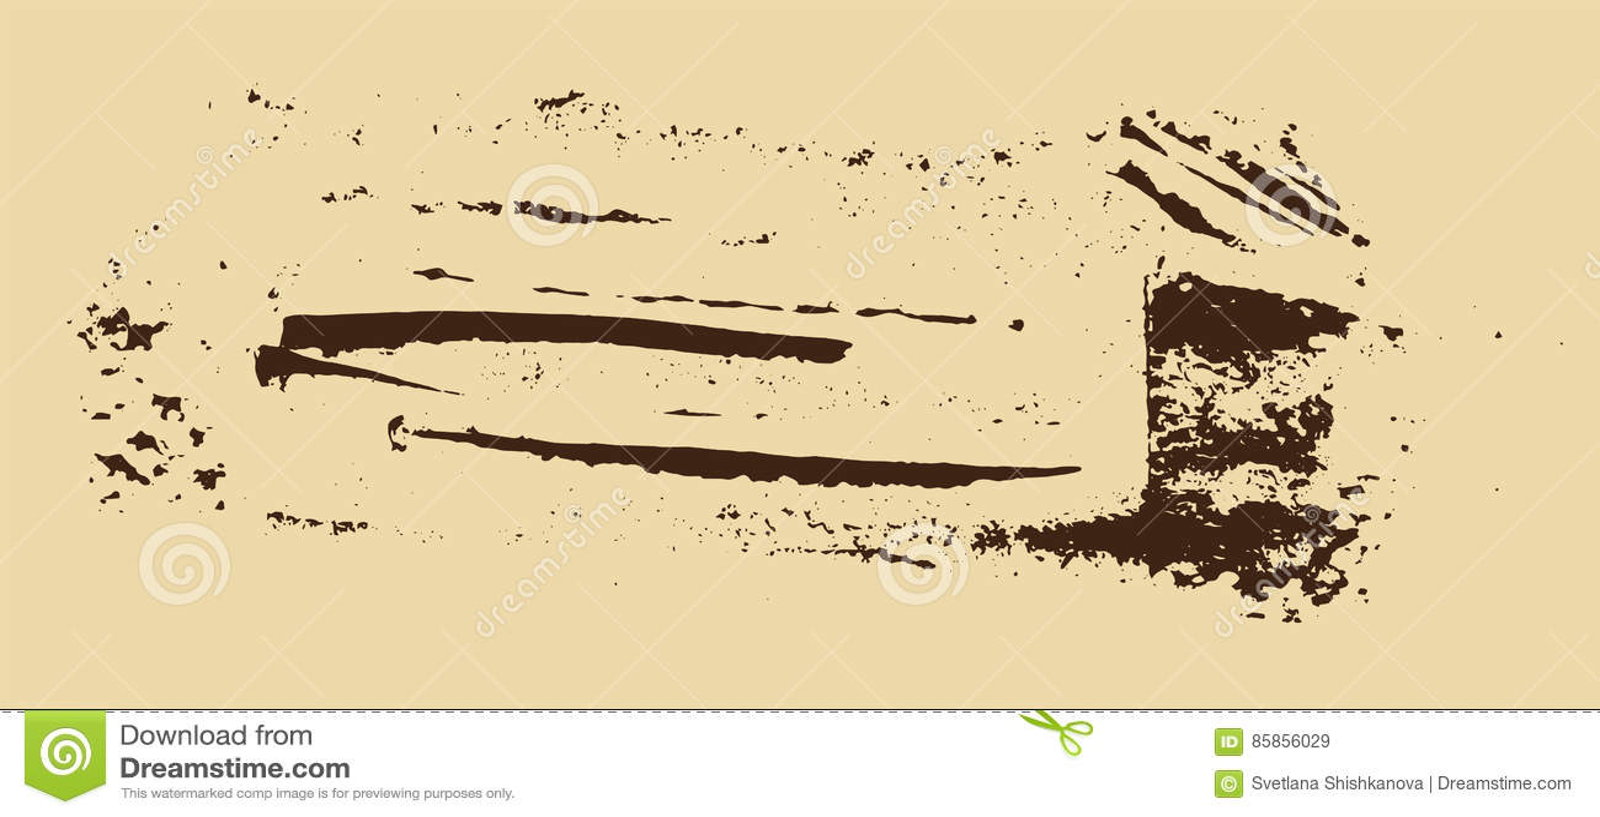 Grunge Texture  Brown Brush On Beige  Vector Template  Urban